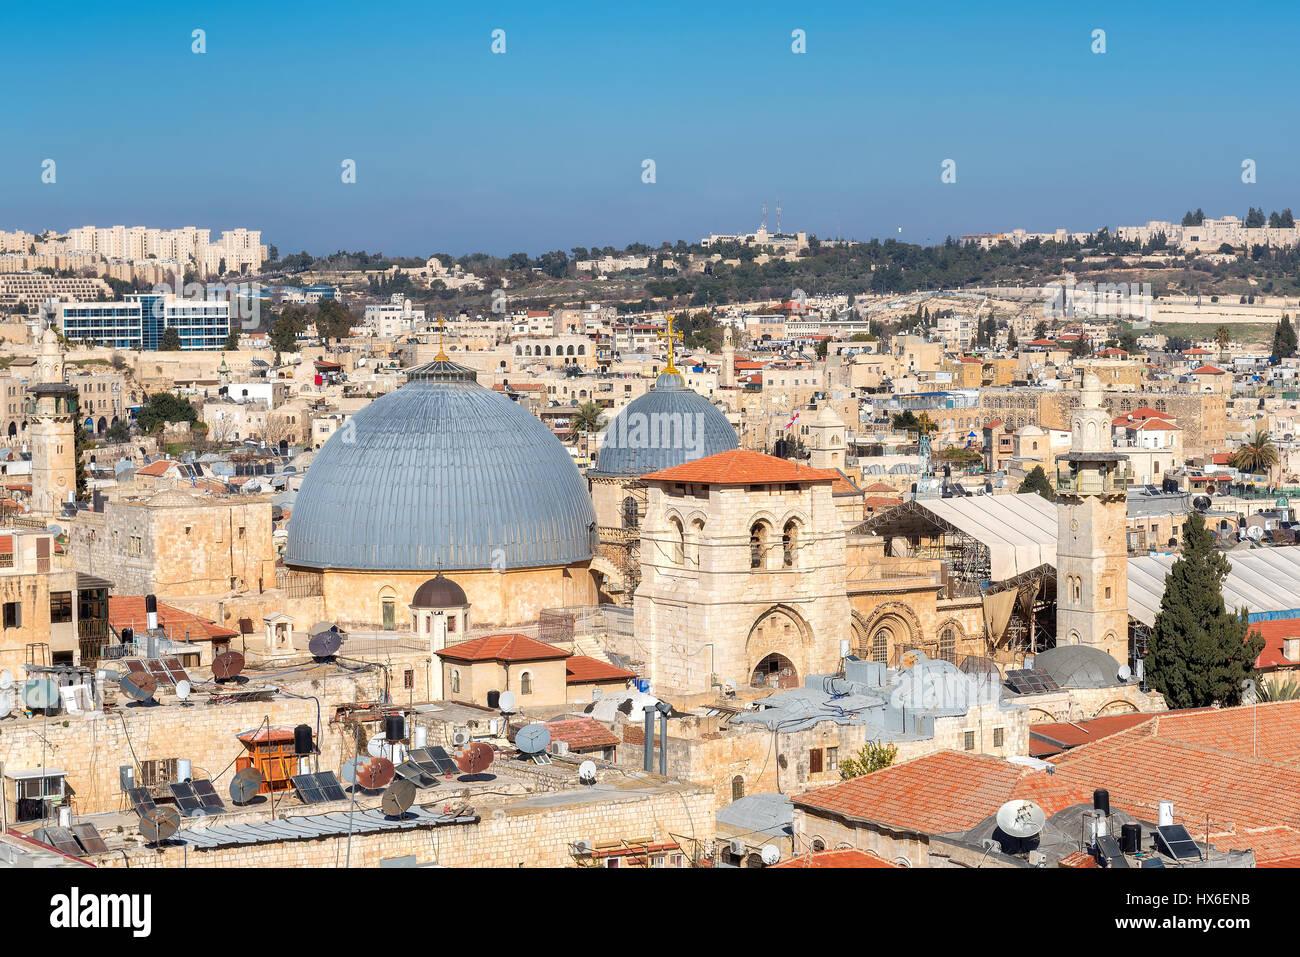 Jerusalem Old City skyline and Church of the Holy Sepulchre, Jerusalem, Israel. - Stock Image